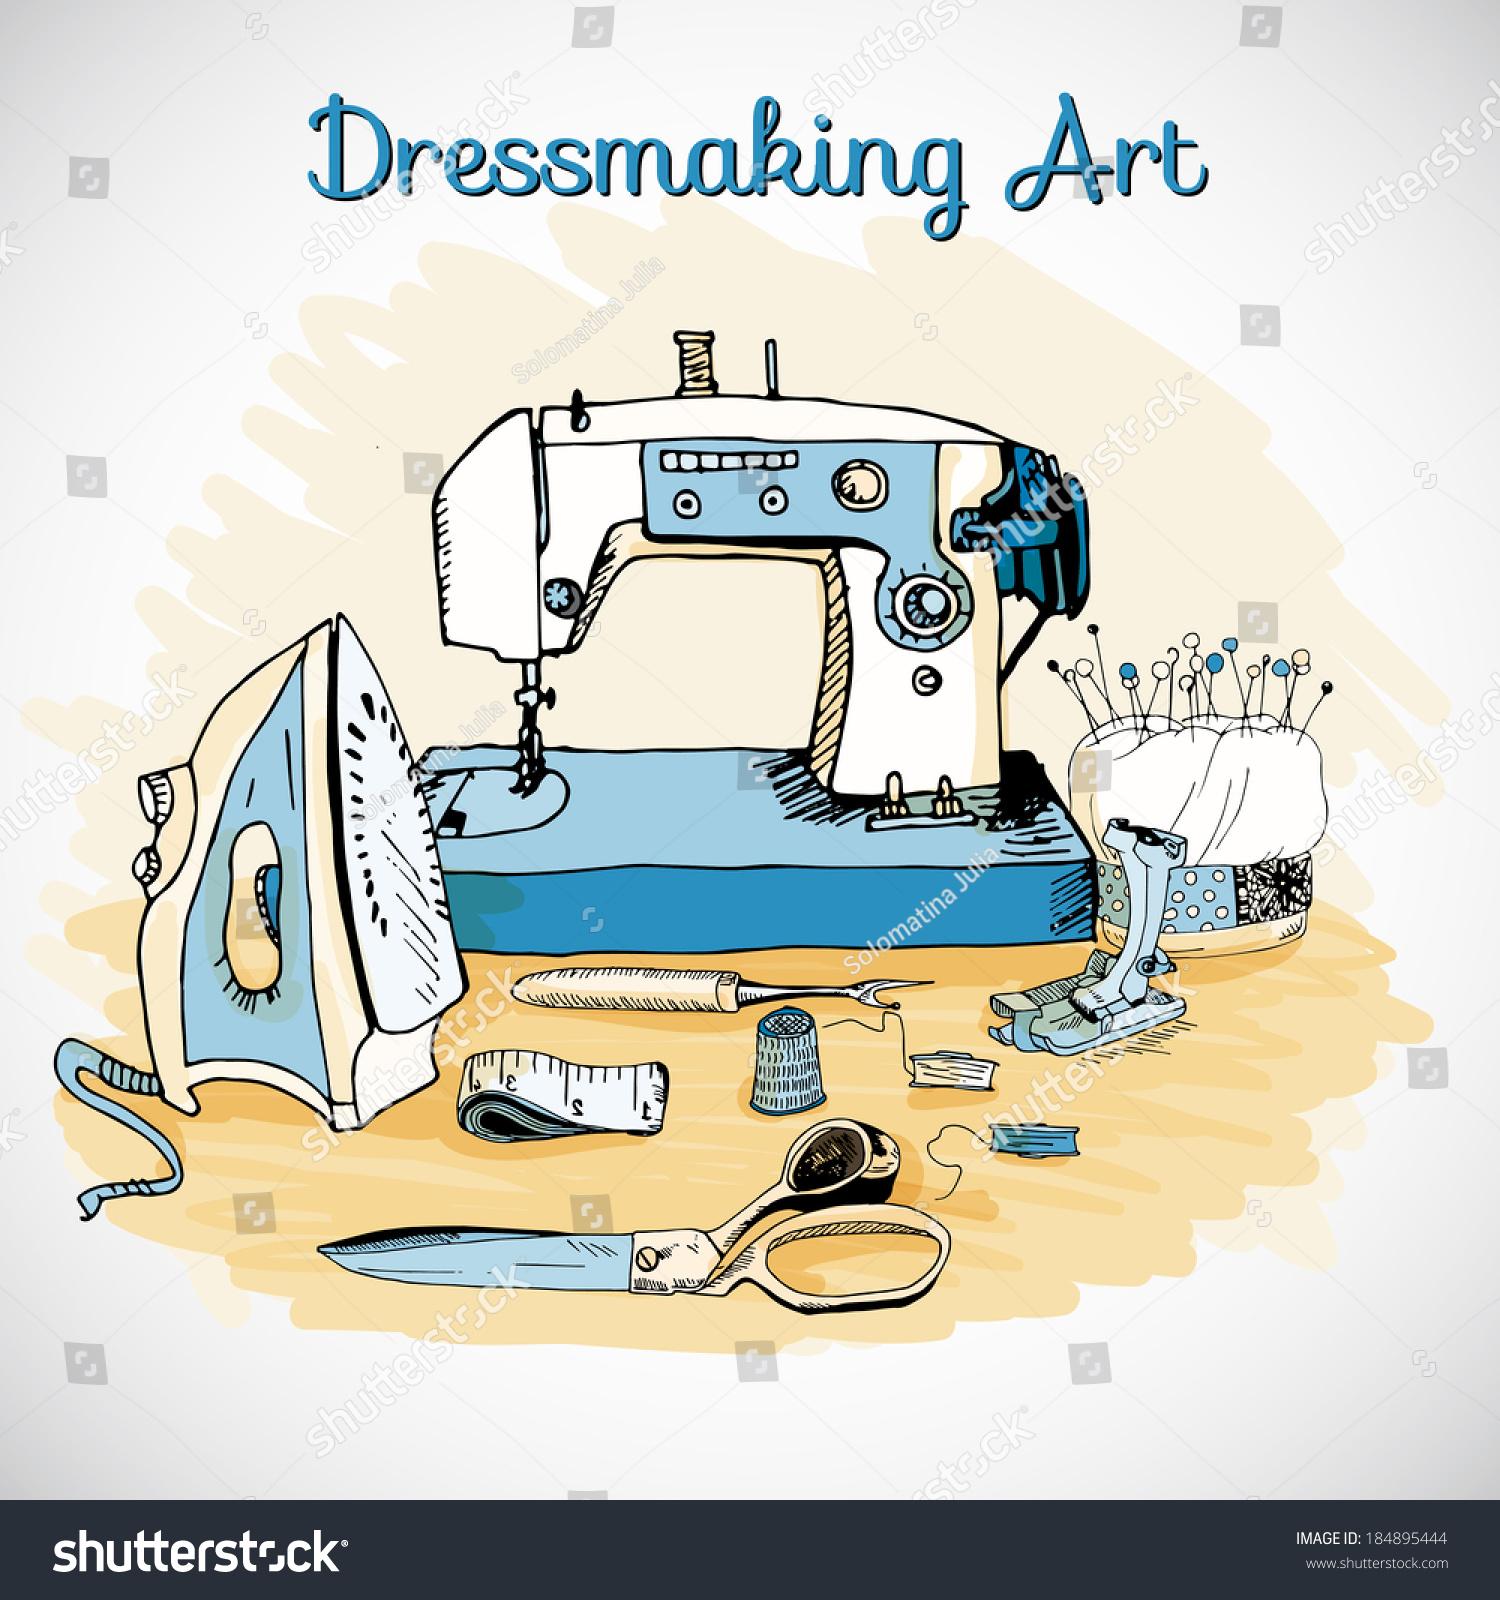 Dressmaking Art Sewing Tools Hand Drawn Stock Vector ...